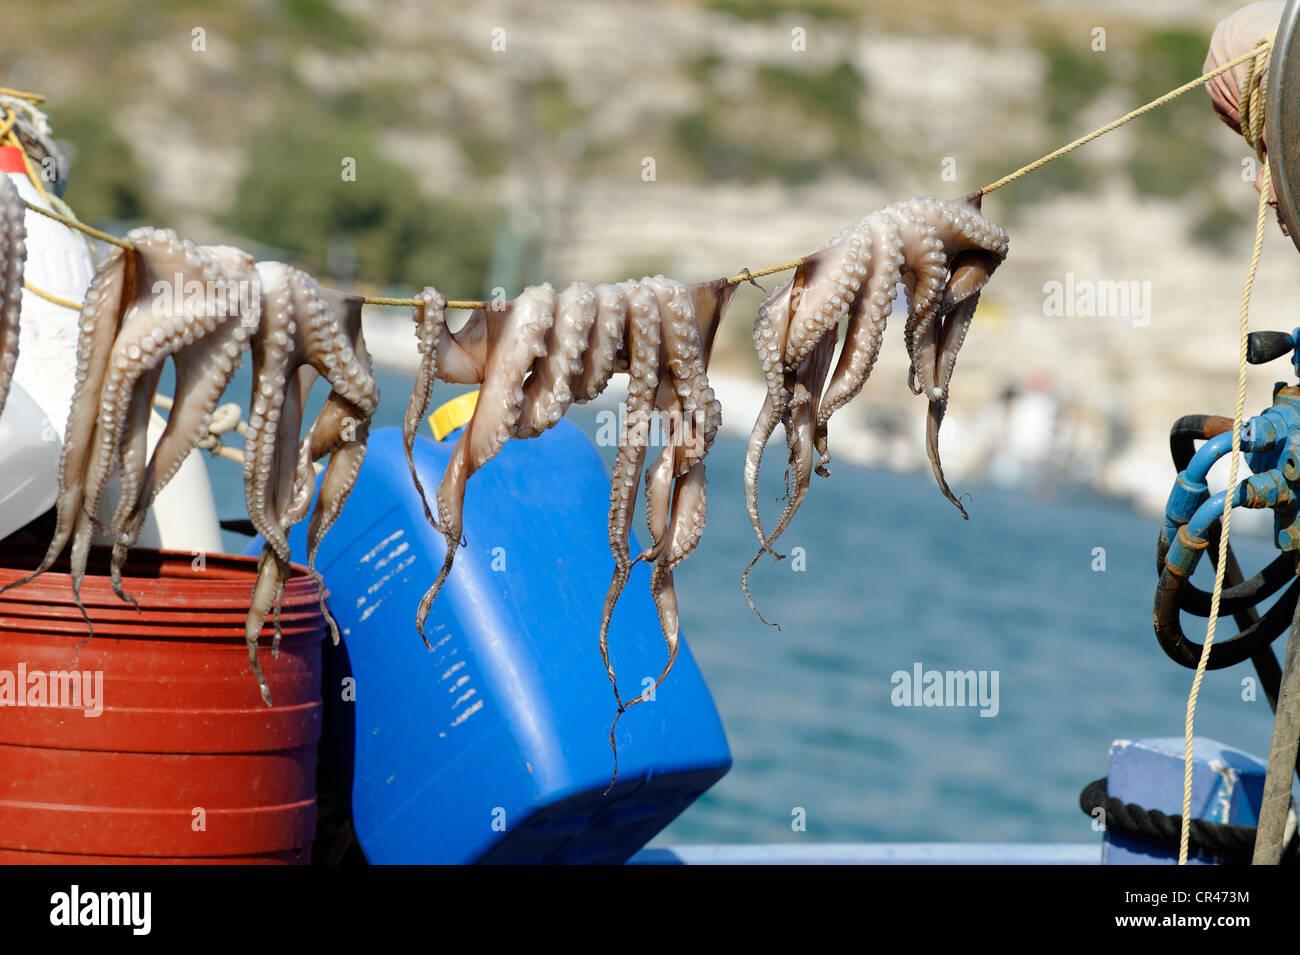 Octopus suspended to dry, port city of Pythagorio, Samos Island, Aegean Sea, southern Sporades islands, Greece, - Stock Image